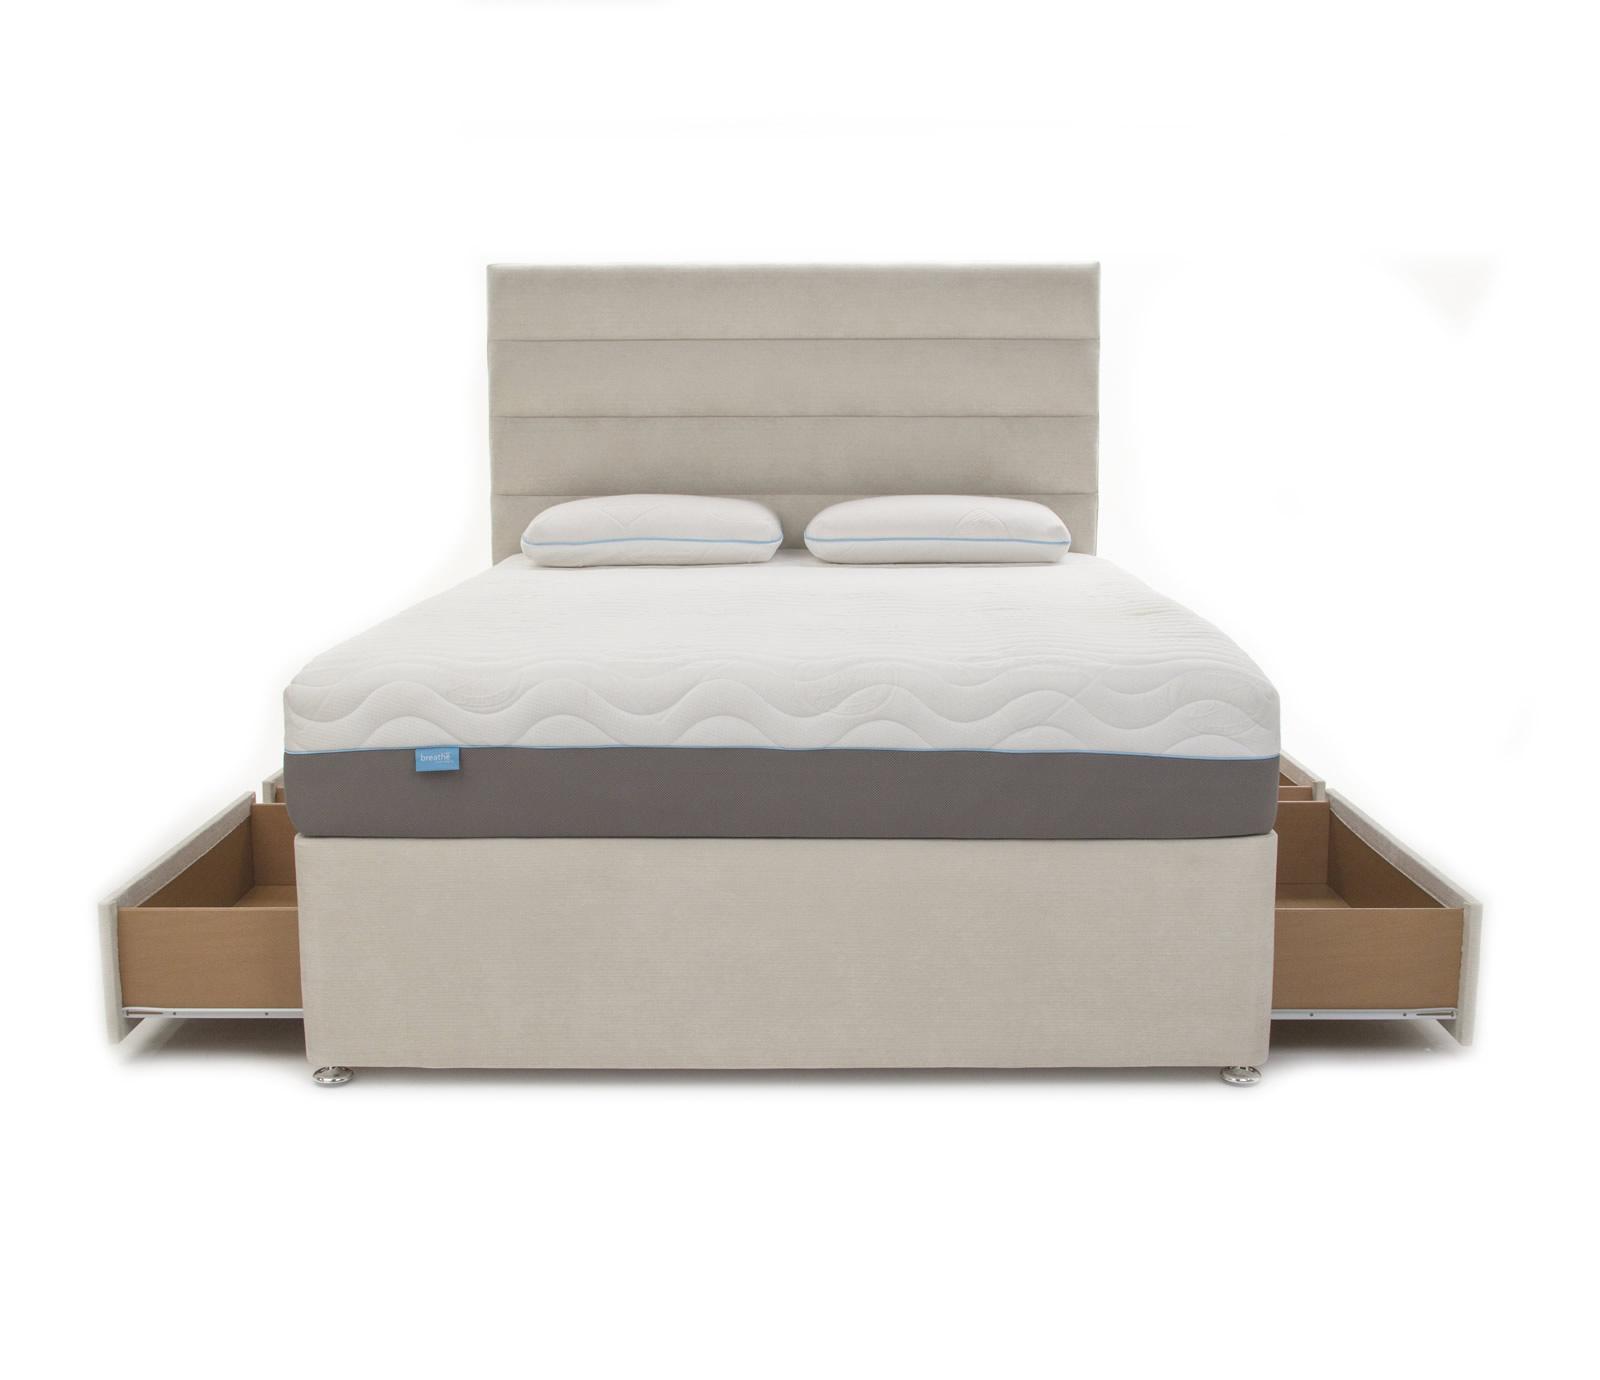 hellosleep-bed-3